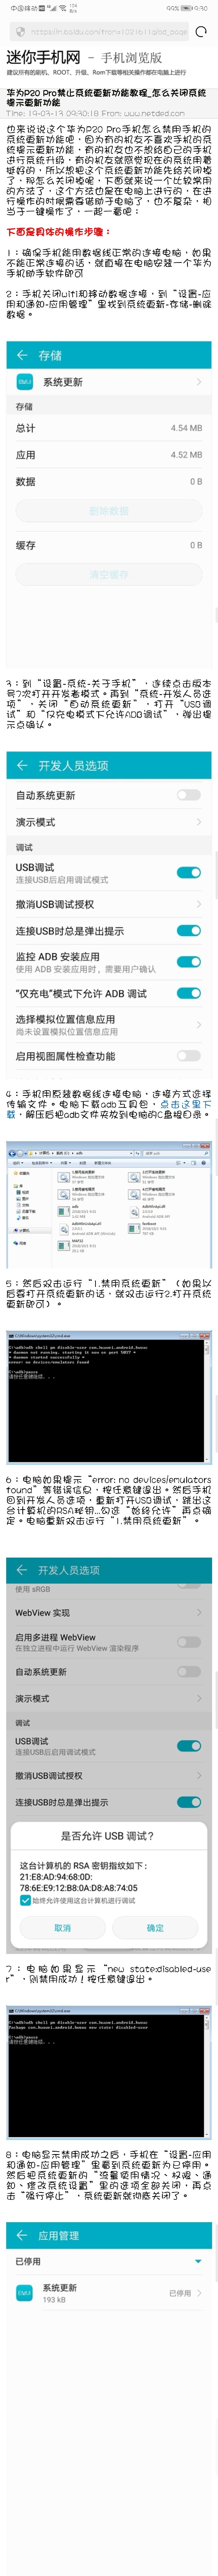 Screenshot_20200519_213044_com.android.browser.jpg